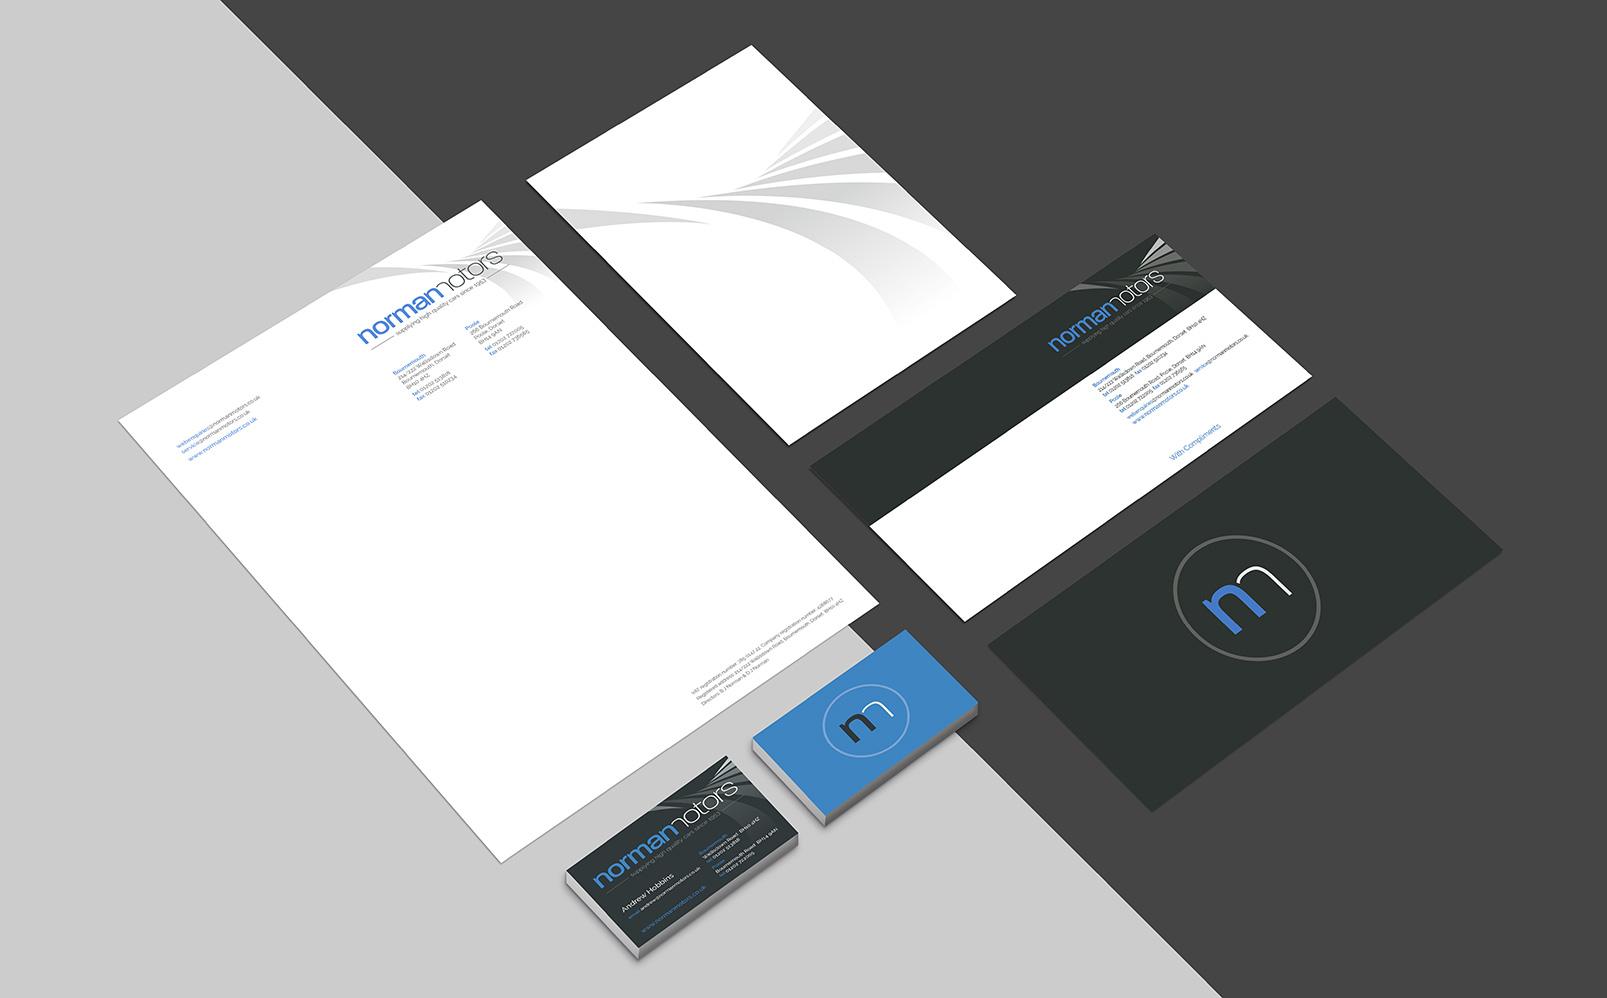 norman-motors-stationery-design.jpg